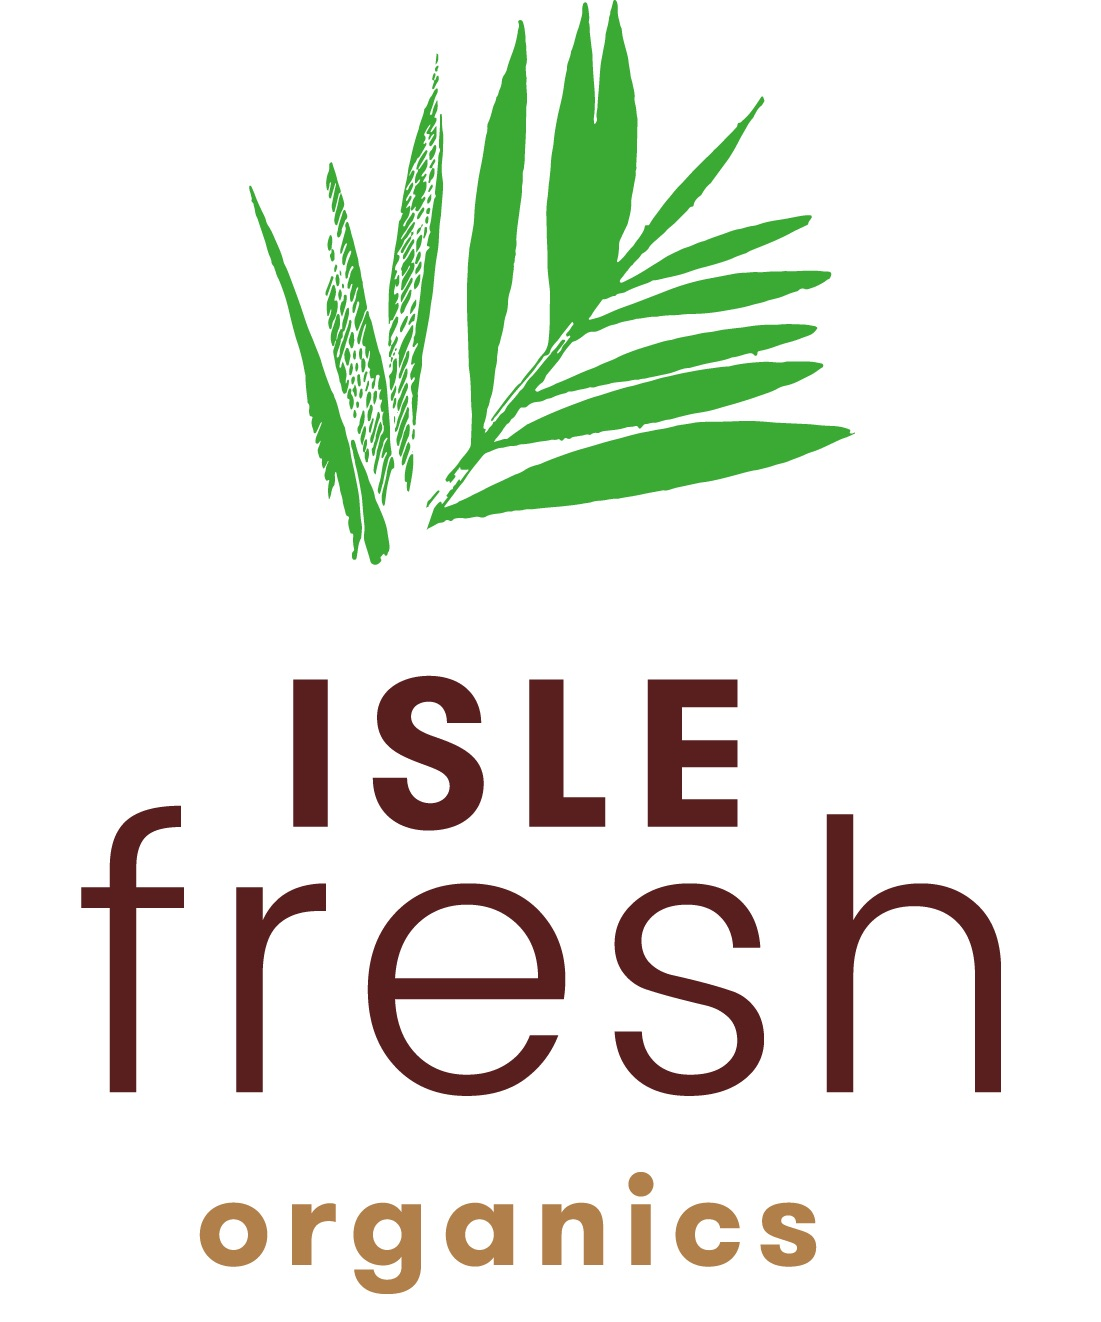 isle fresh logo jpg (1)